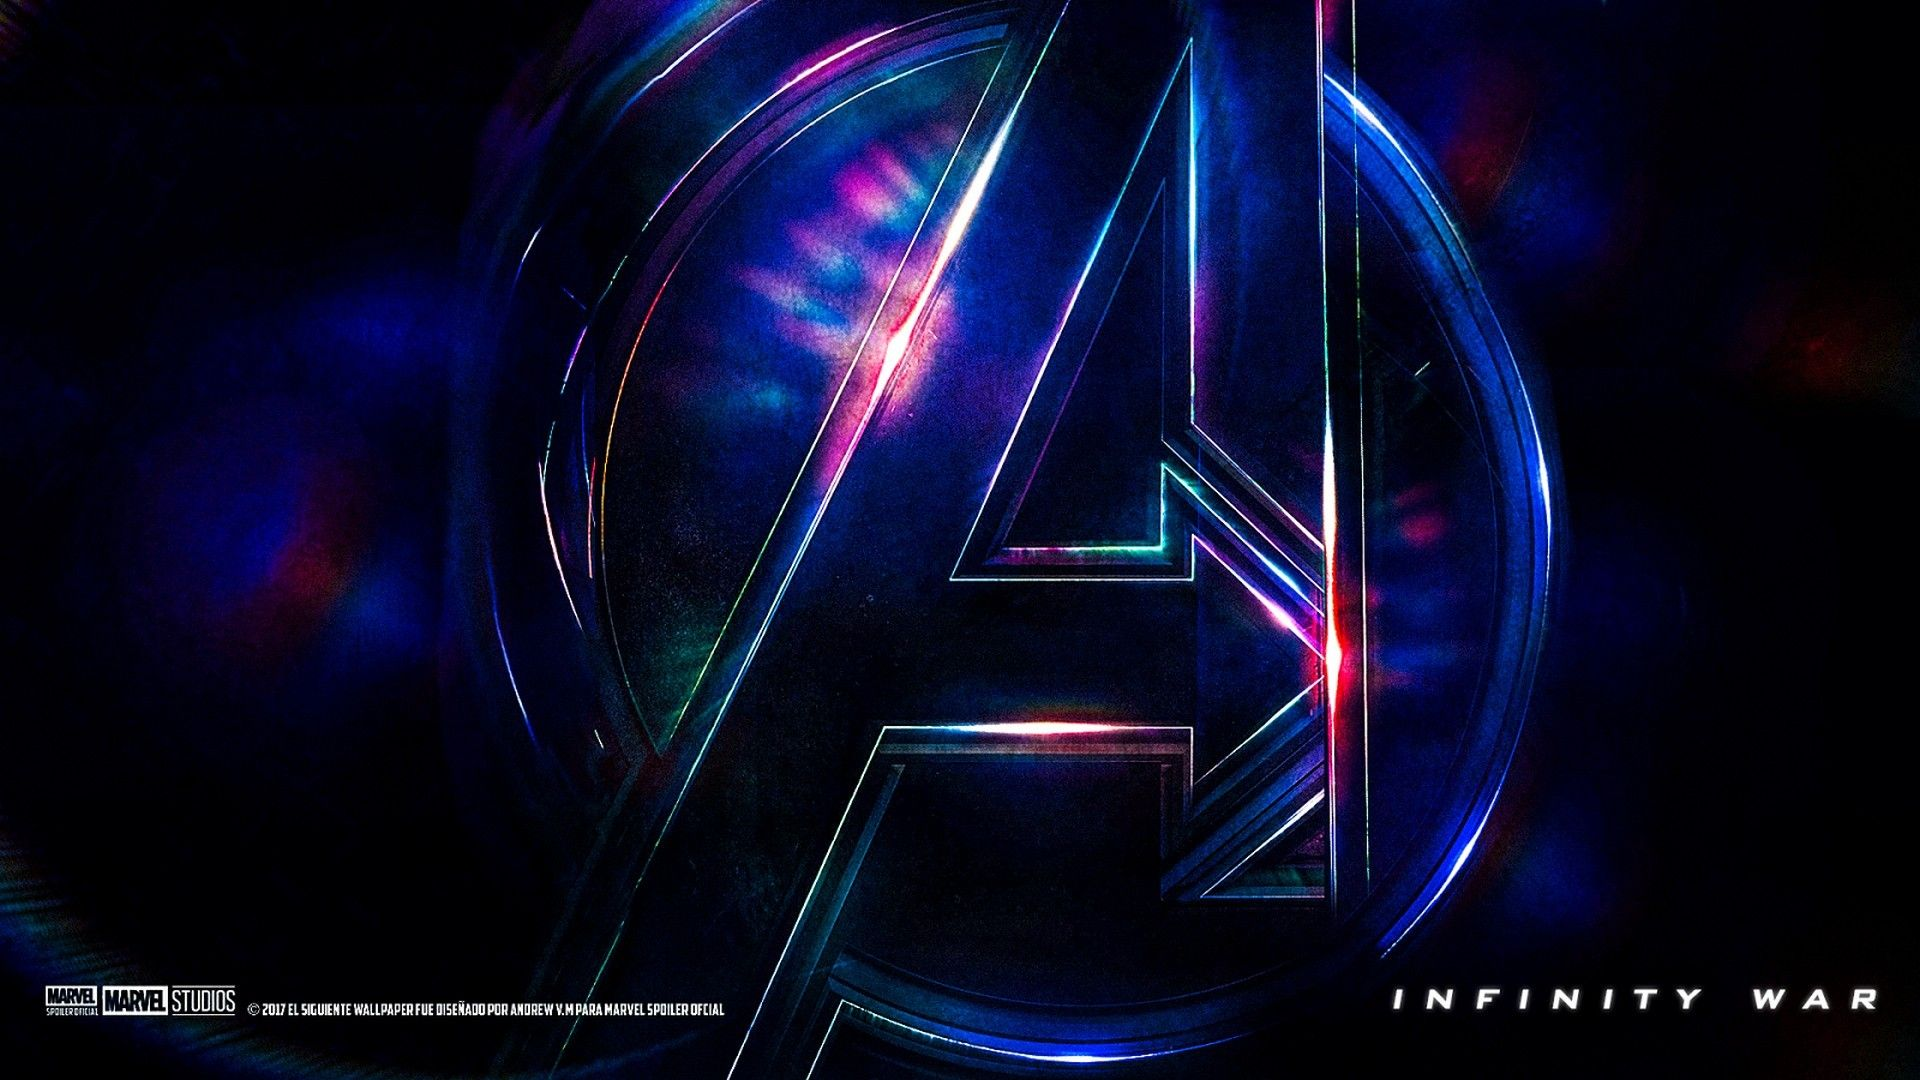 Best Avengers Infinity War Wallpaper Avengers infinity